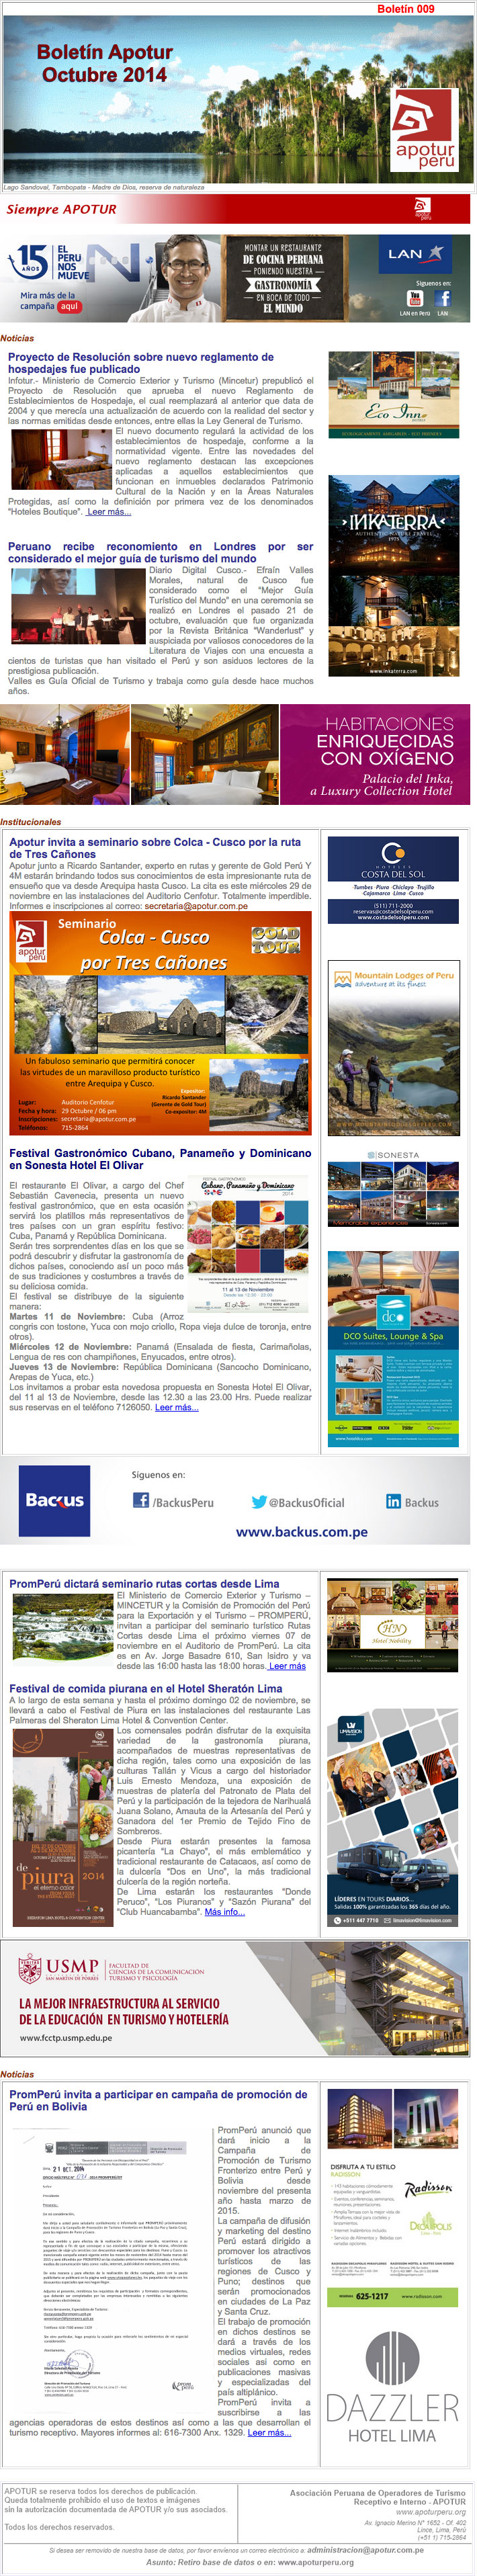 Boletín Apotur N° 9 - Octubre 2014